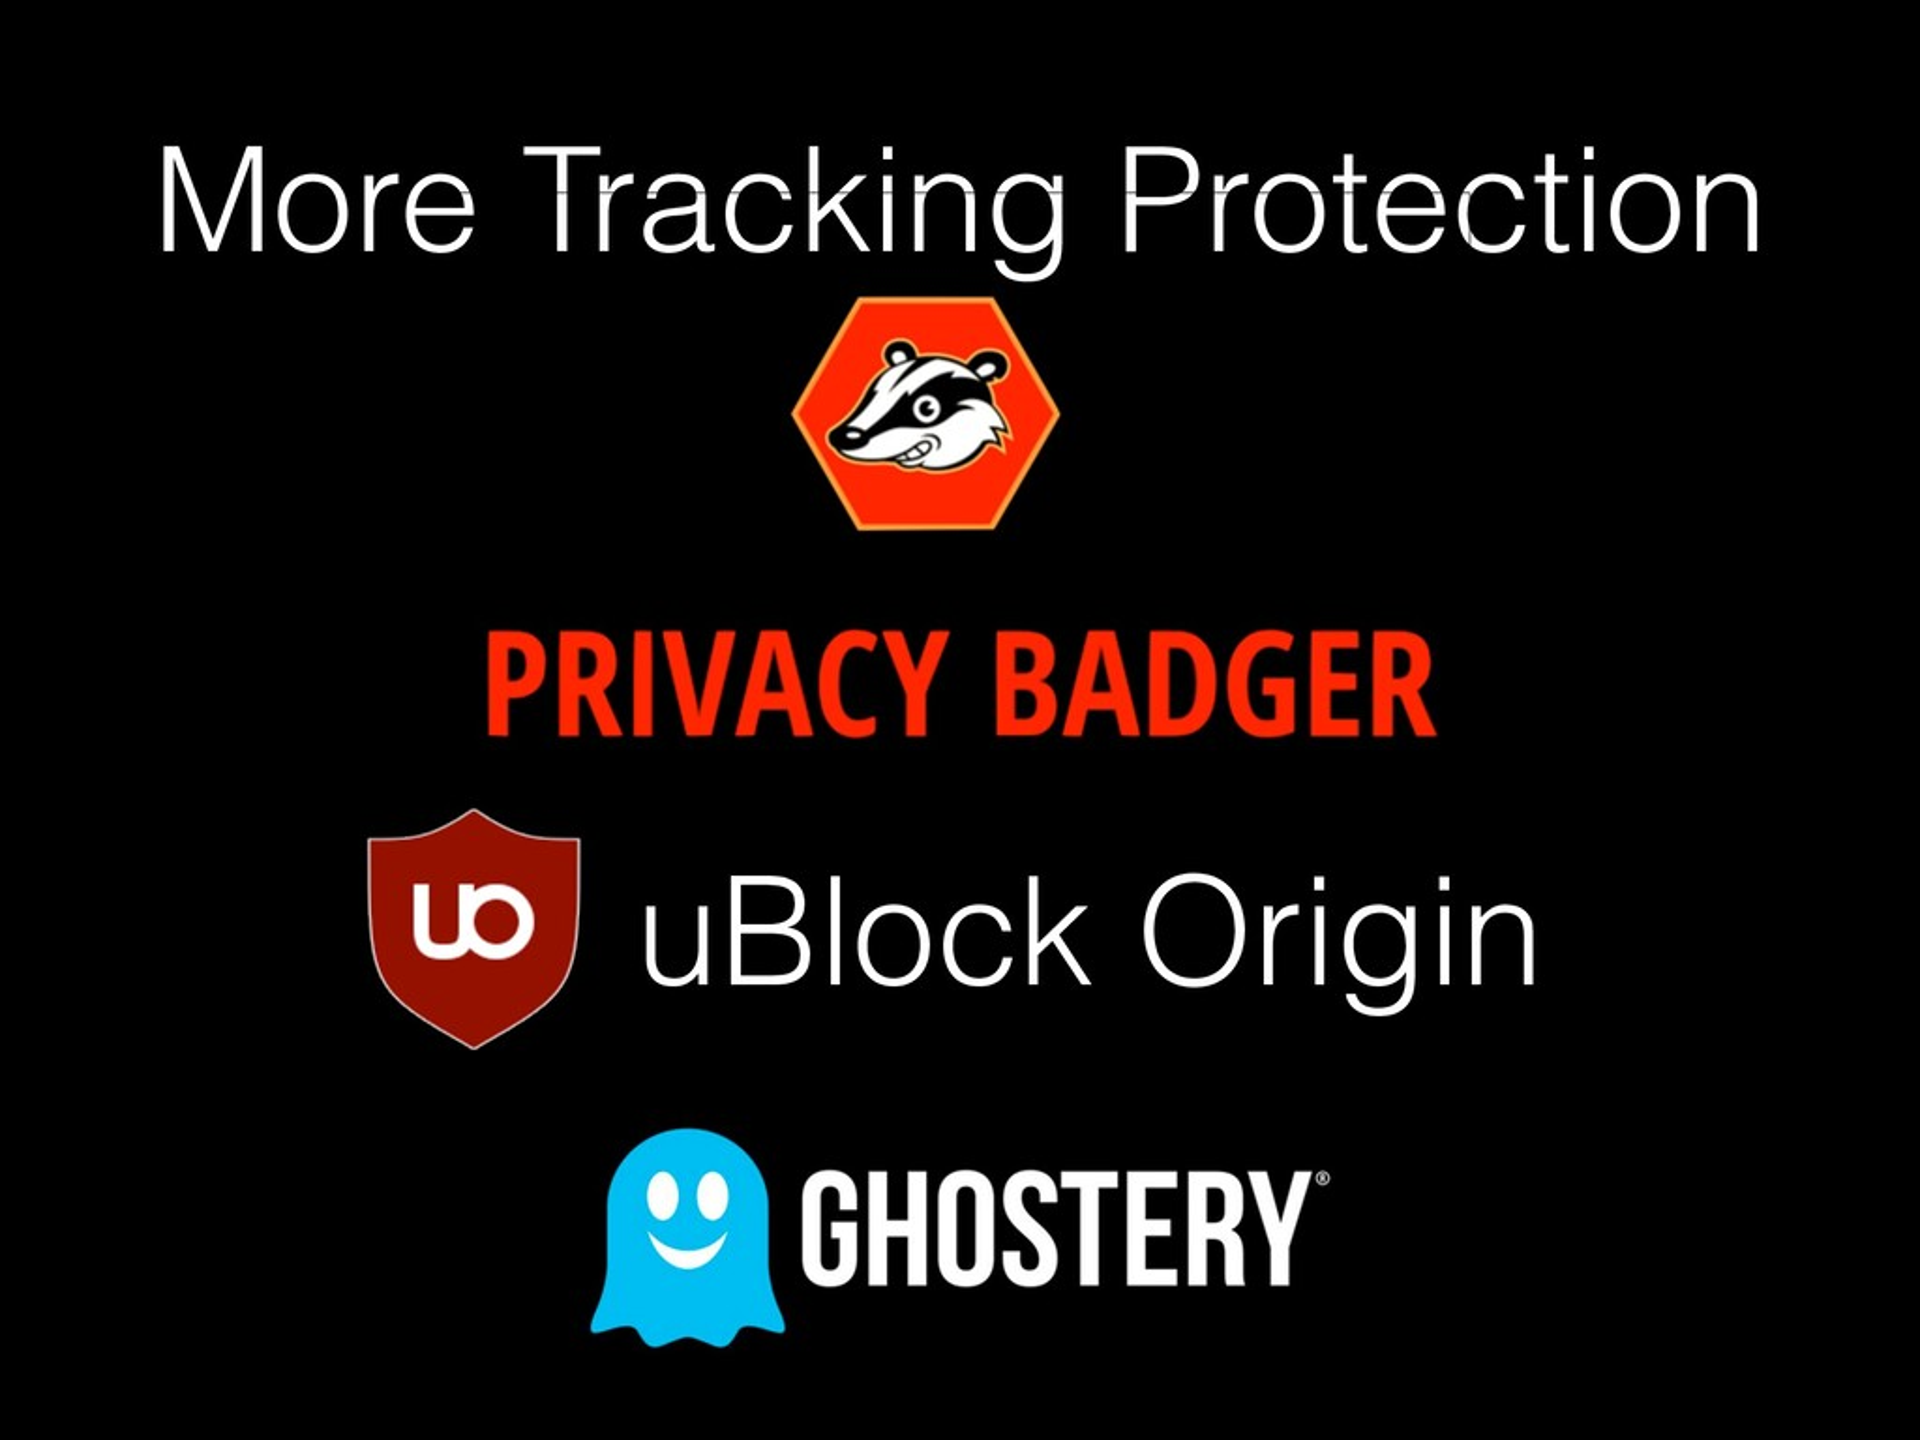 More Tracking Protection uBlock Origin